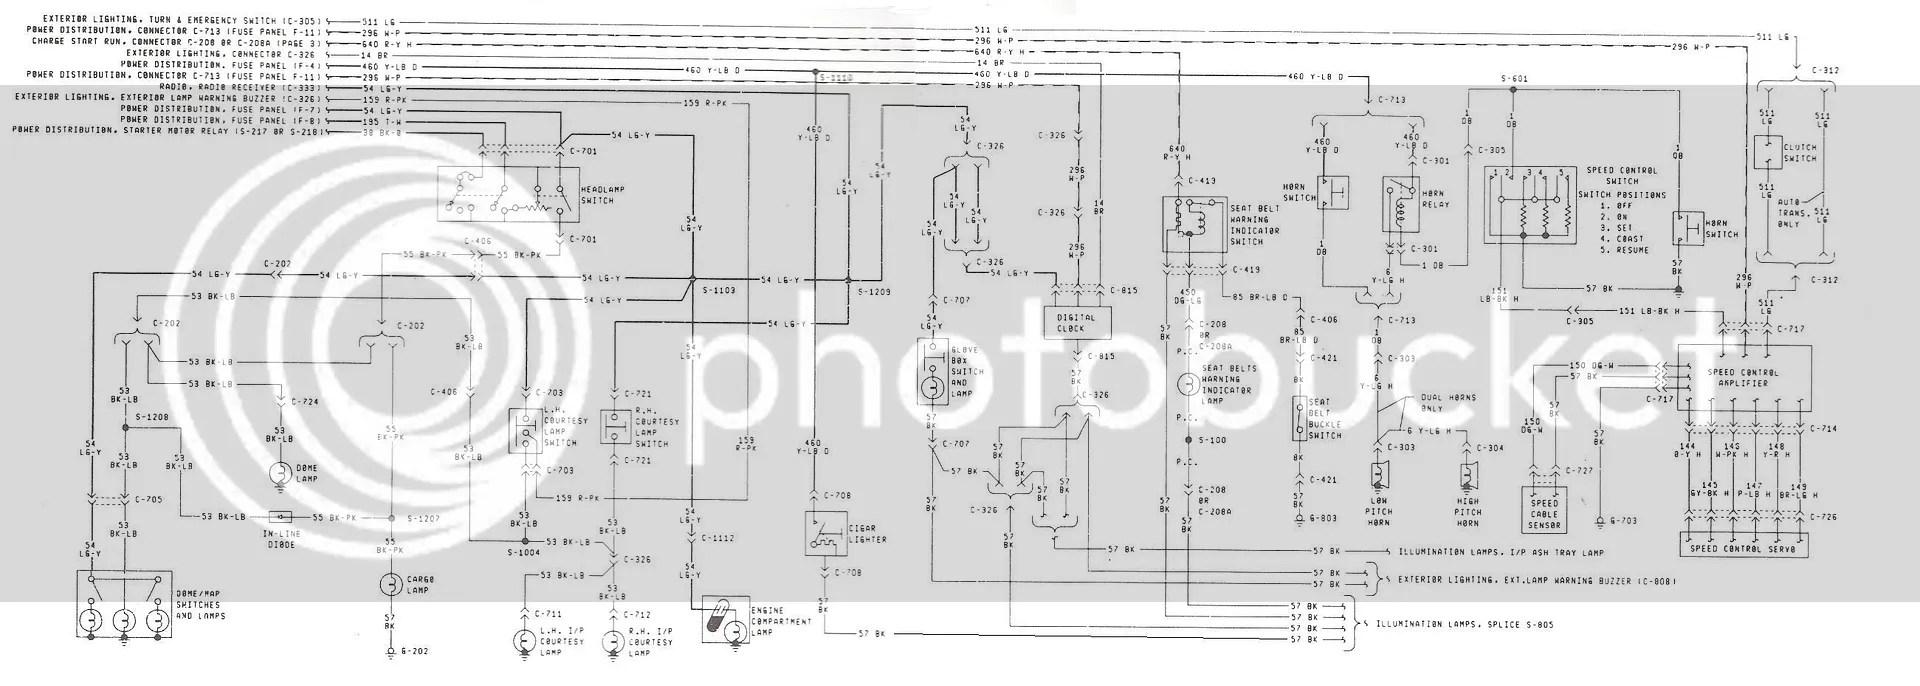 F 150 Horn Wiring Diagram